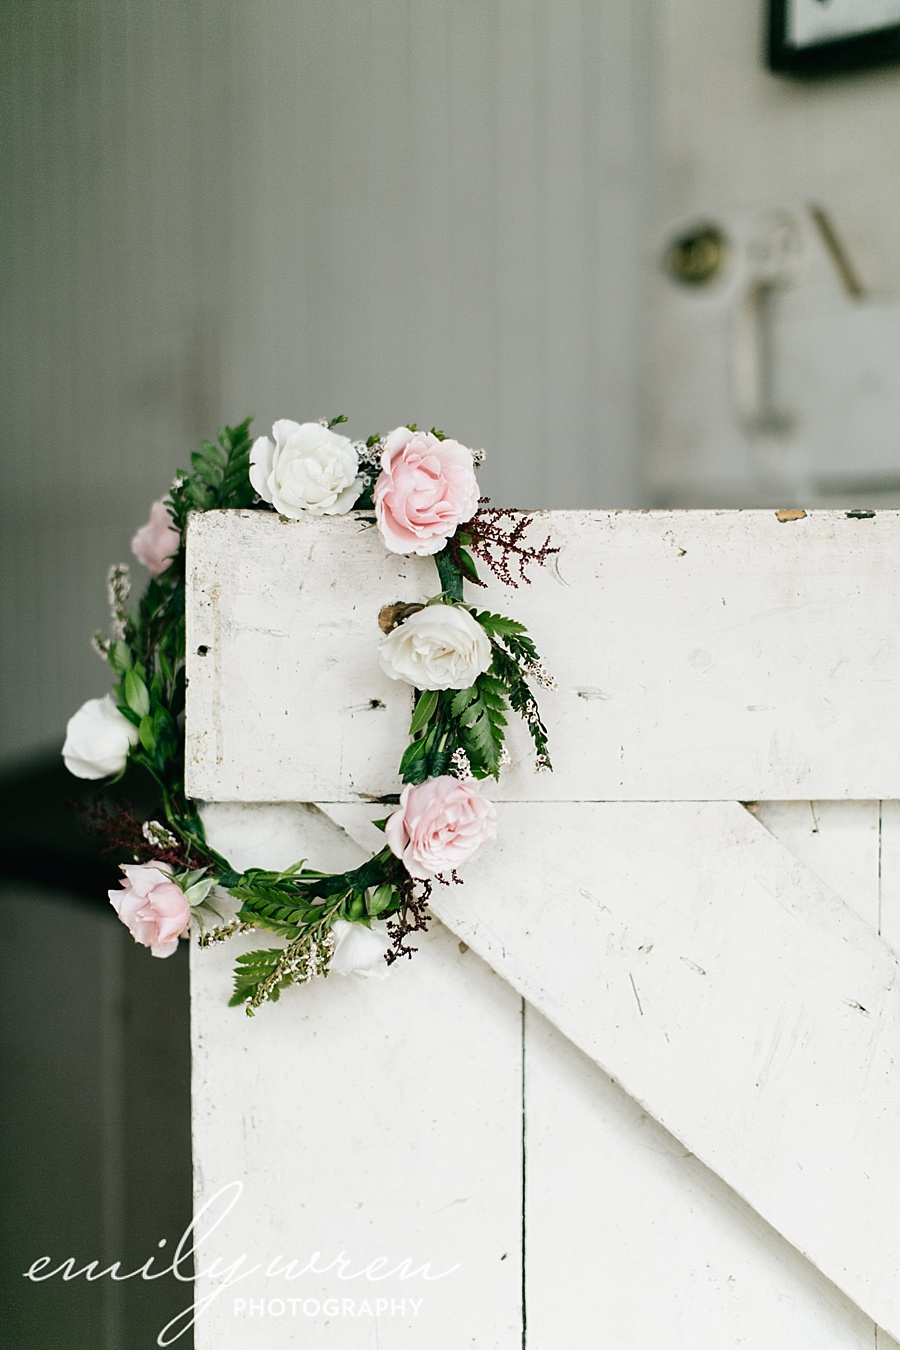 Emily_Wren_Photography_April_Lynn_Designs_Ash_Mill_Farm_Jill_John_October_Rustic_Wedding_Flannel_Farm_Sheep_Holicong_New_Hope025